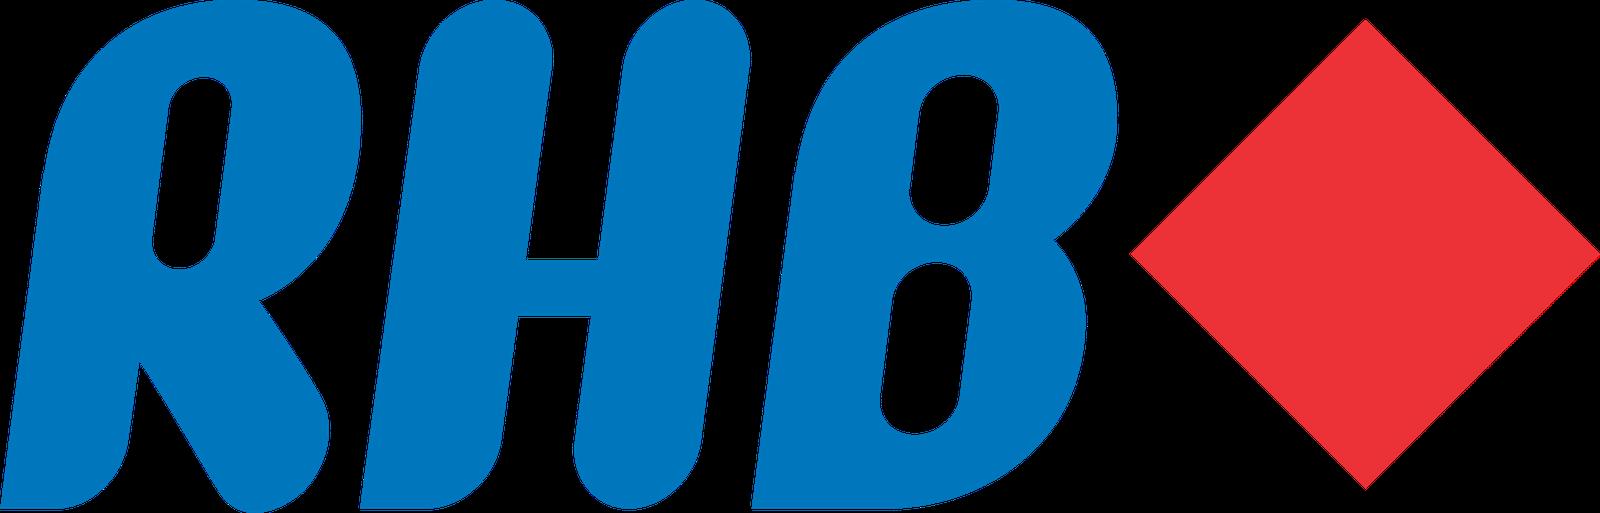 Brands Genius Rhb Bank